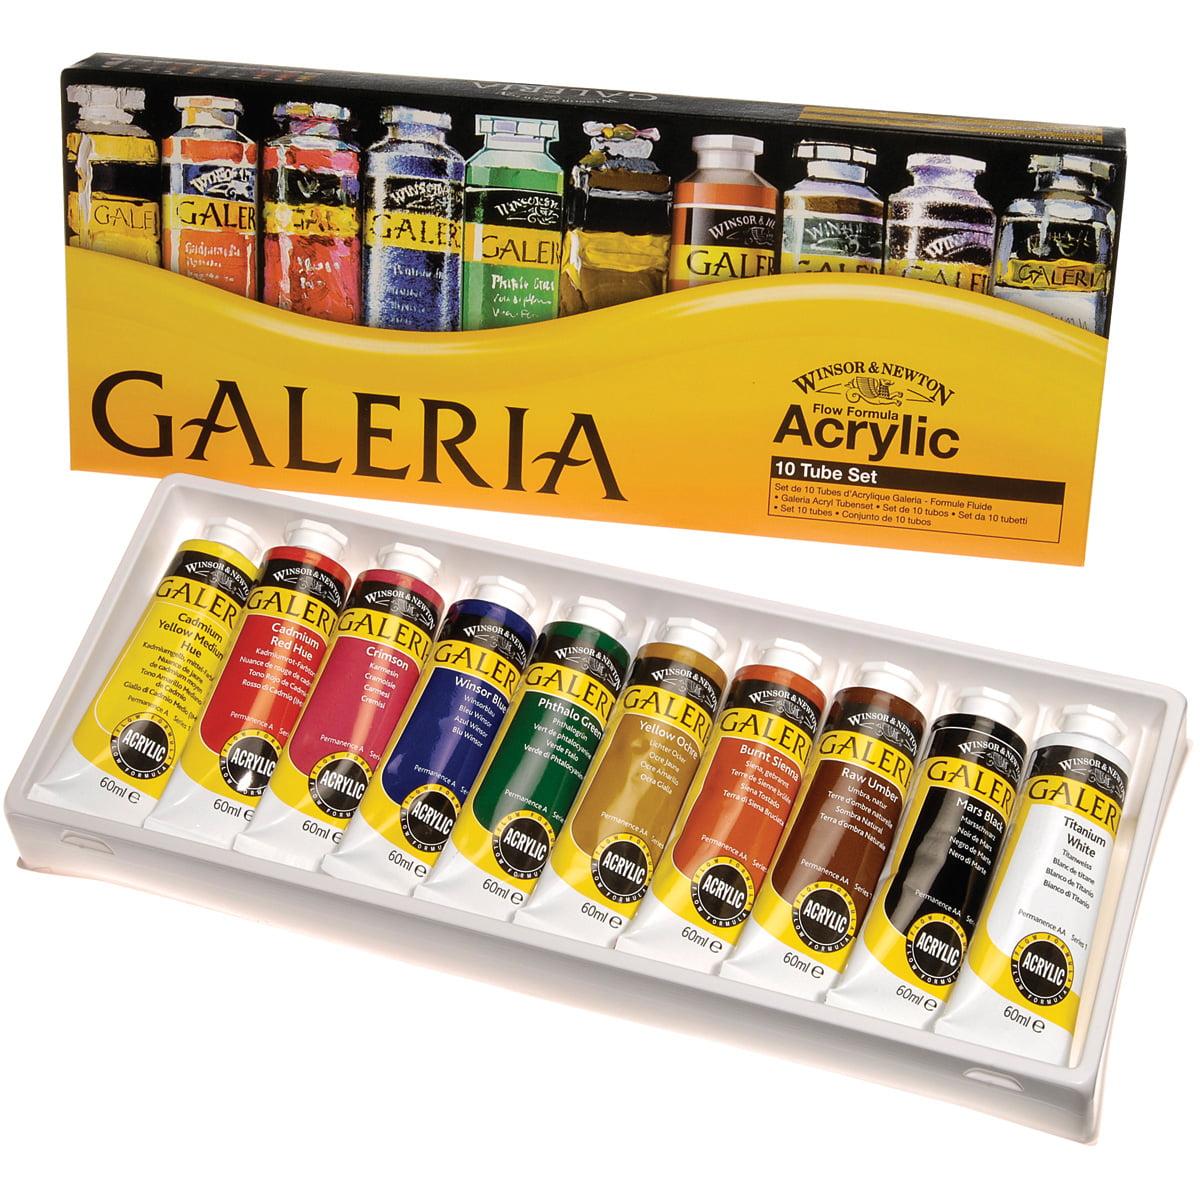 Winsor & Newton Galeria Acrylic Paint 60ml 10/Pkg-Assorted Colors